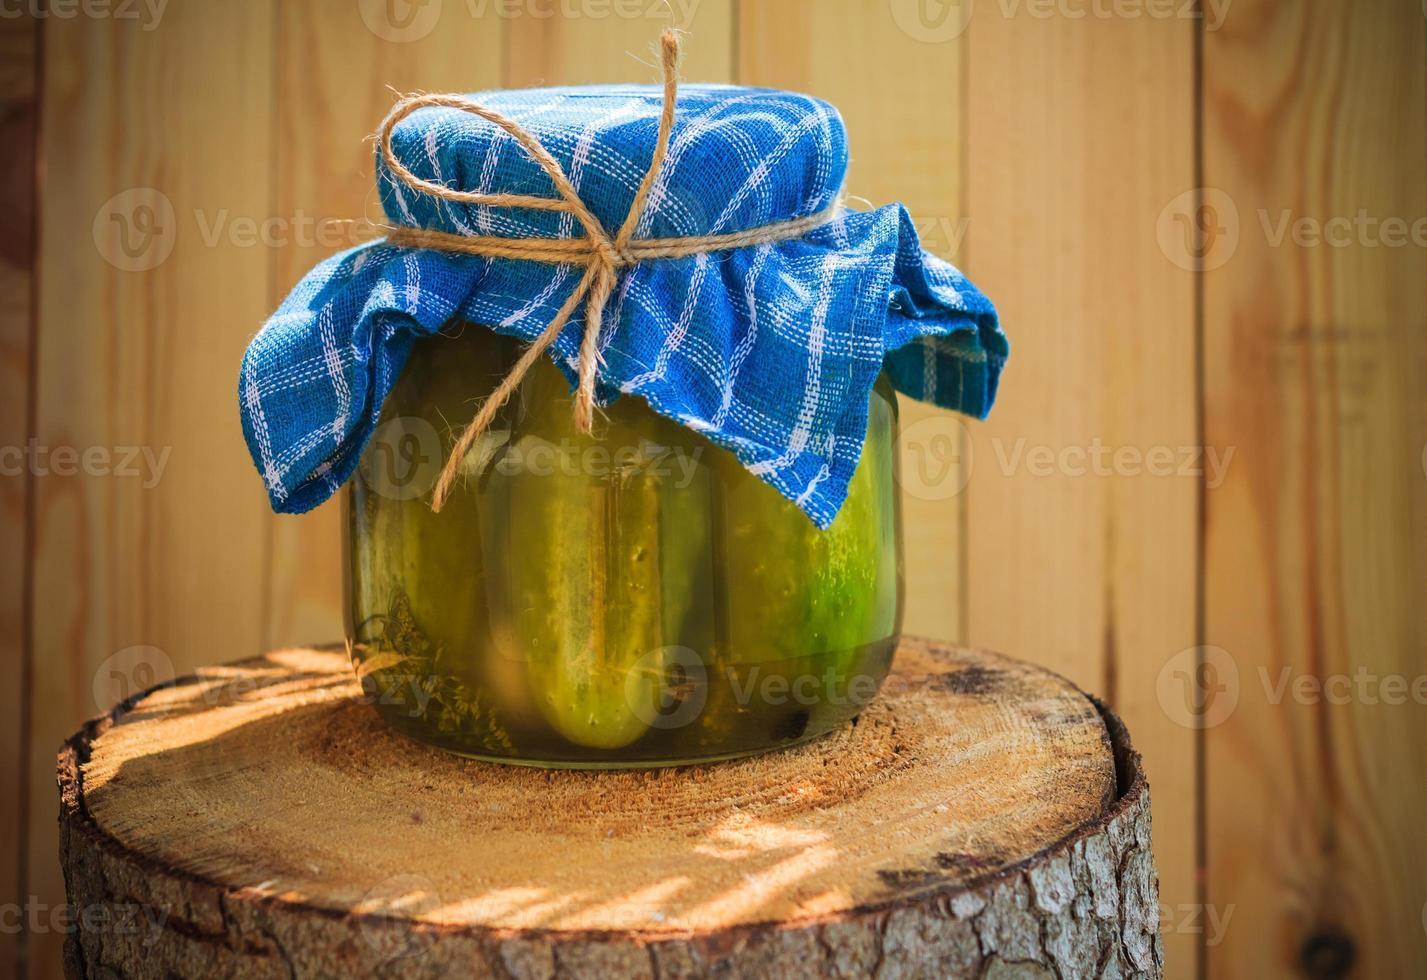 Jar pickled cucumbers wooden stump photo